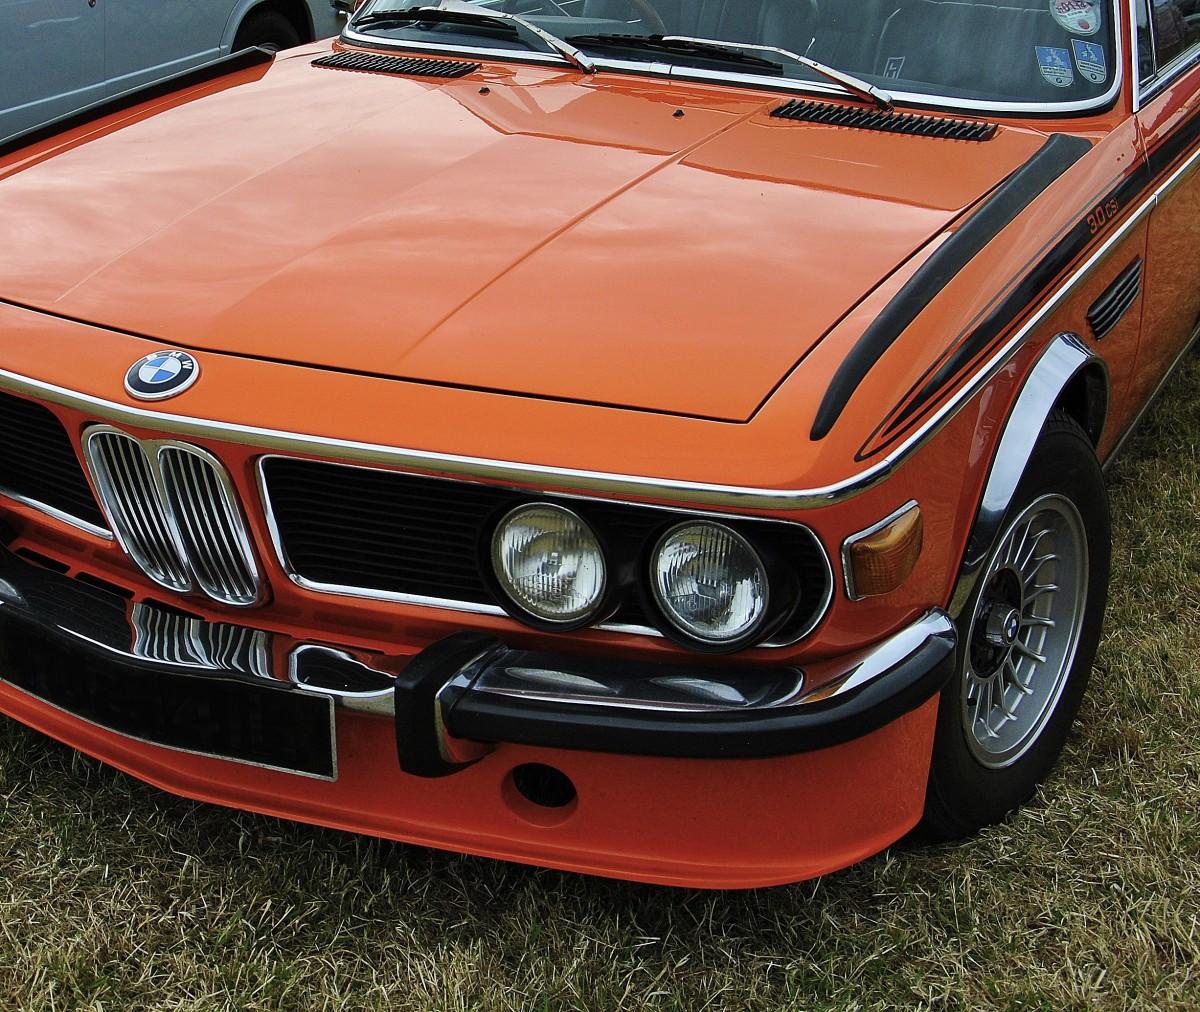 Bmwcars: Free Images : Leather, Nostalgia, Classic Car, Sports Car